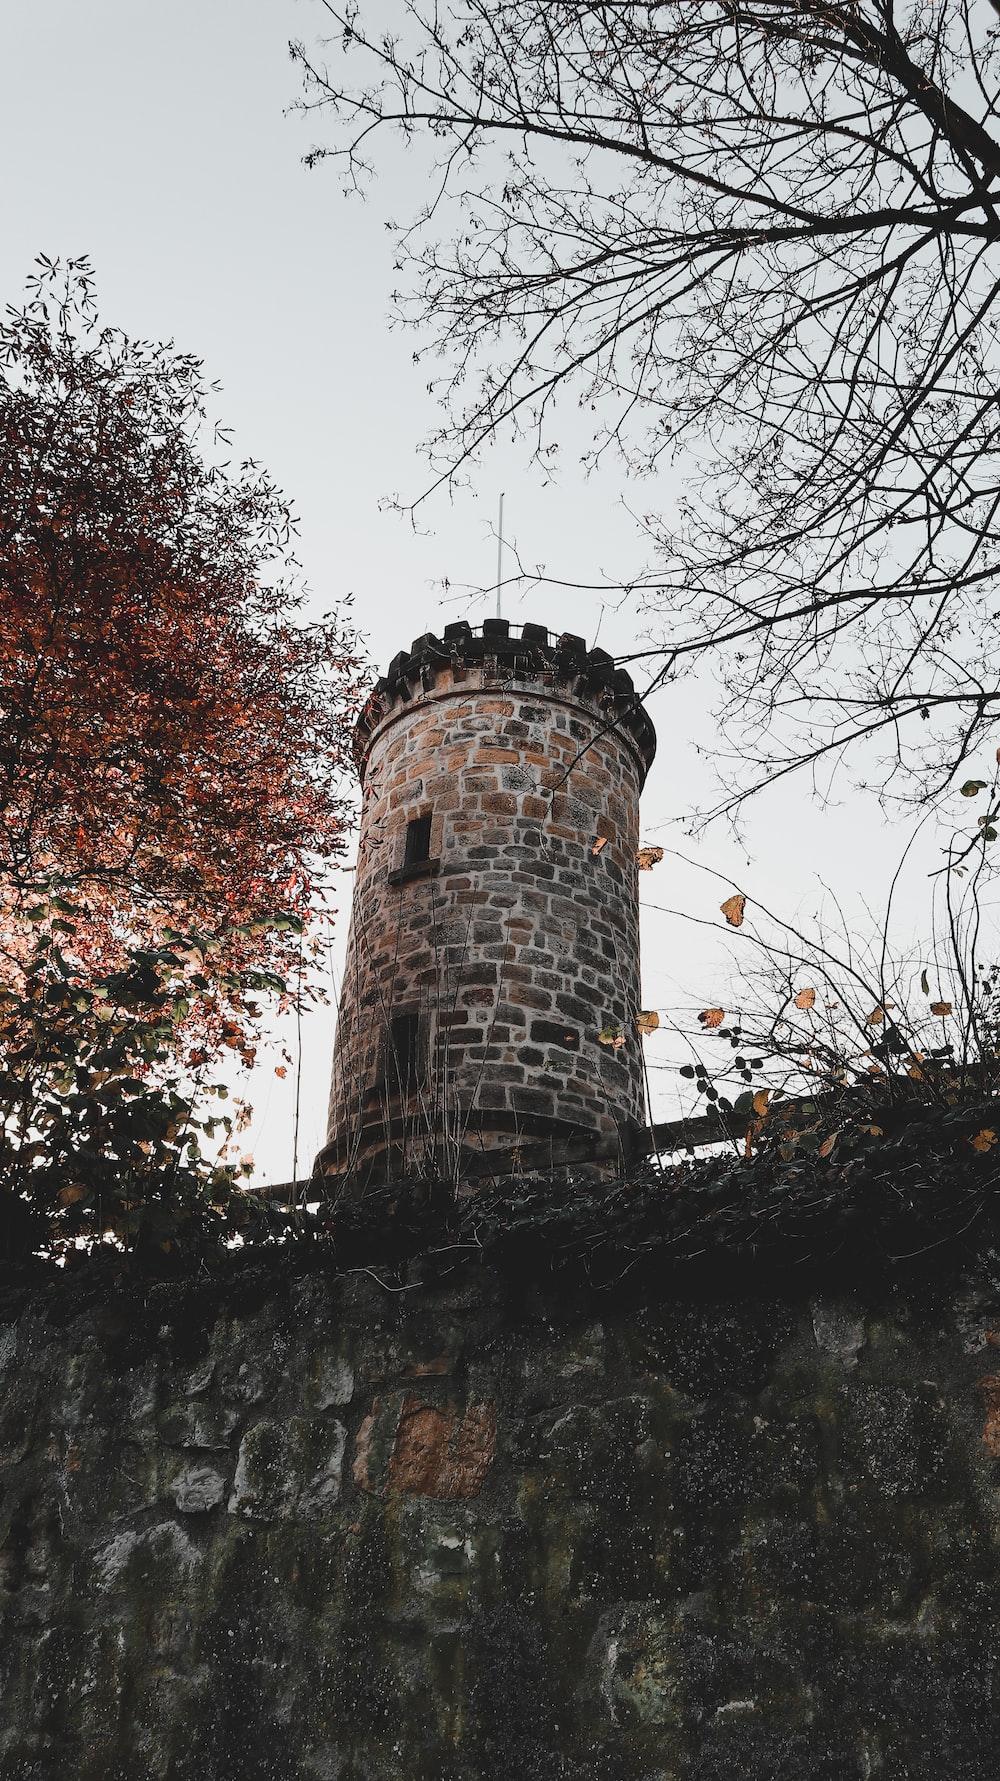 brown brick tower near trees